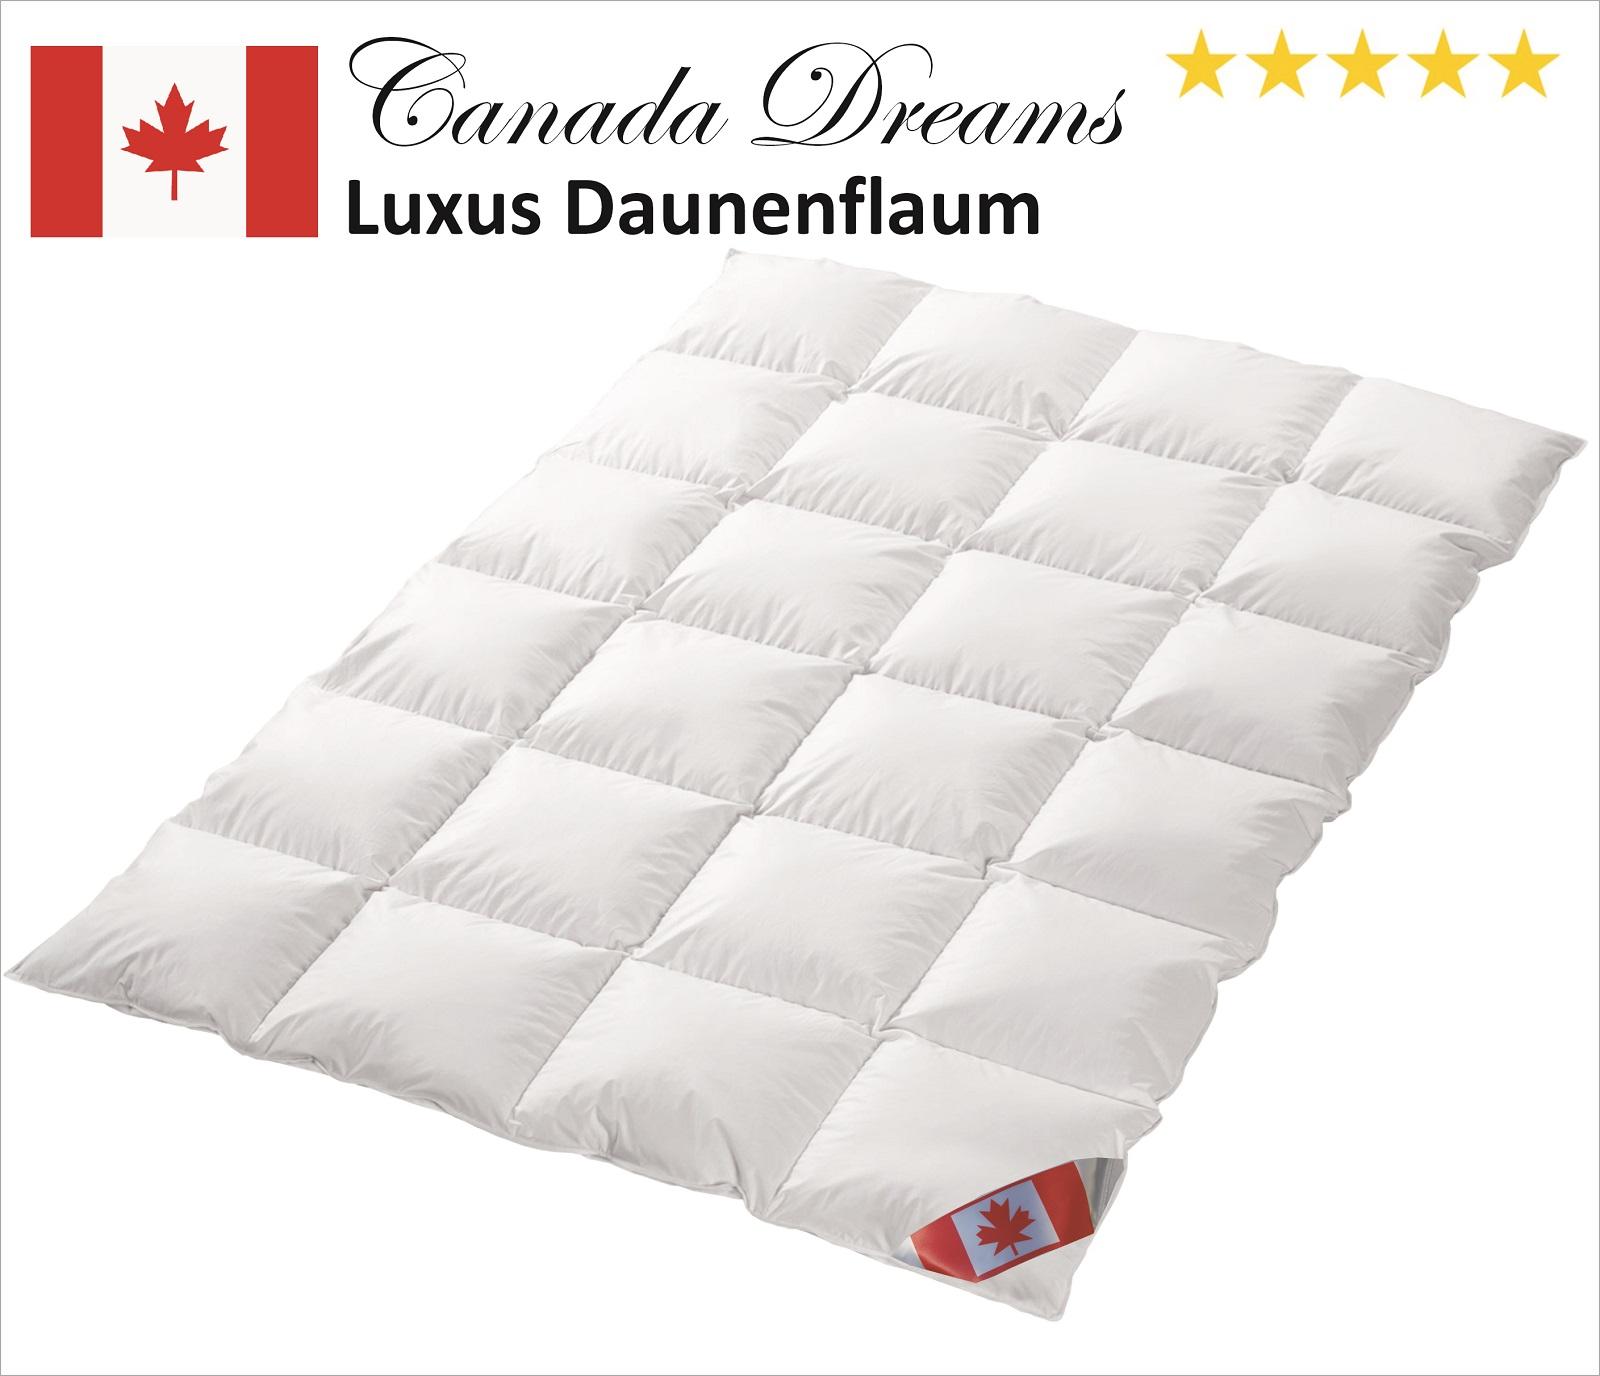 Canada Dreams Luxus Ganzjahres Daunendecke Wärmegrad 3 240x220 cm